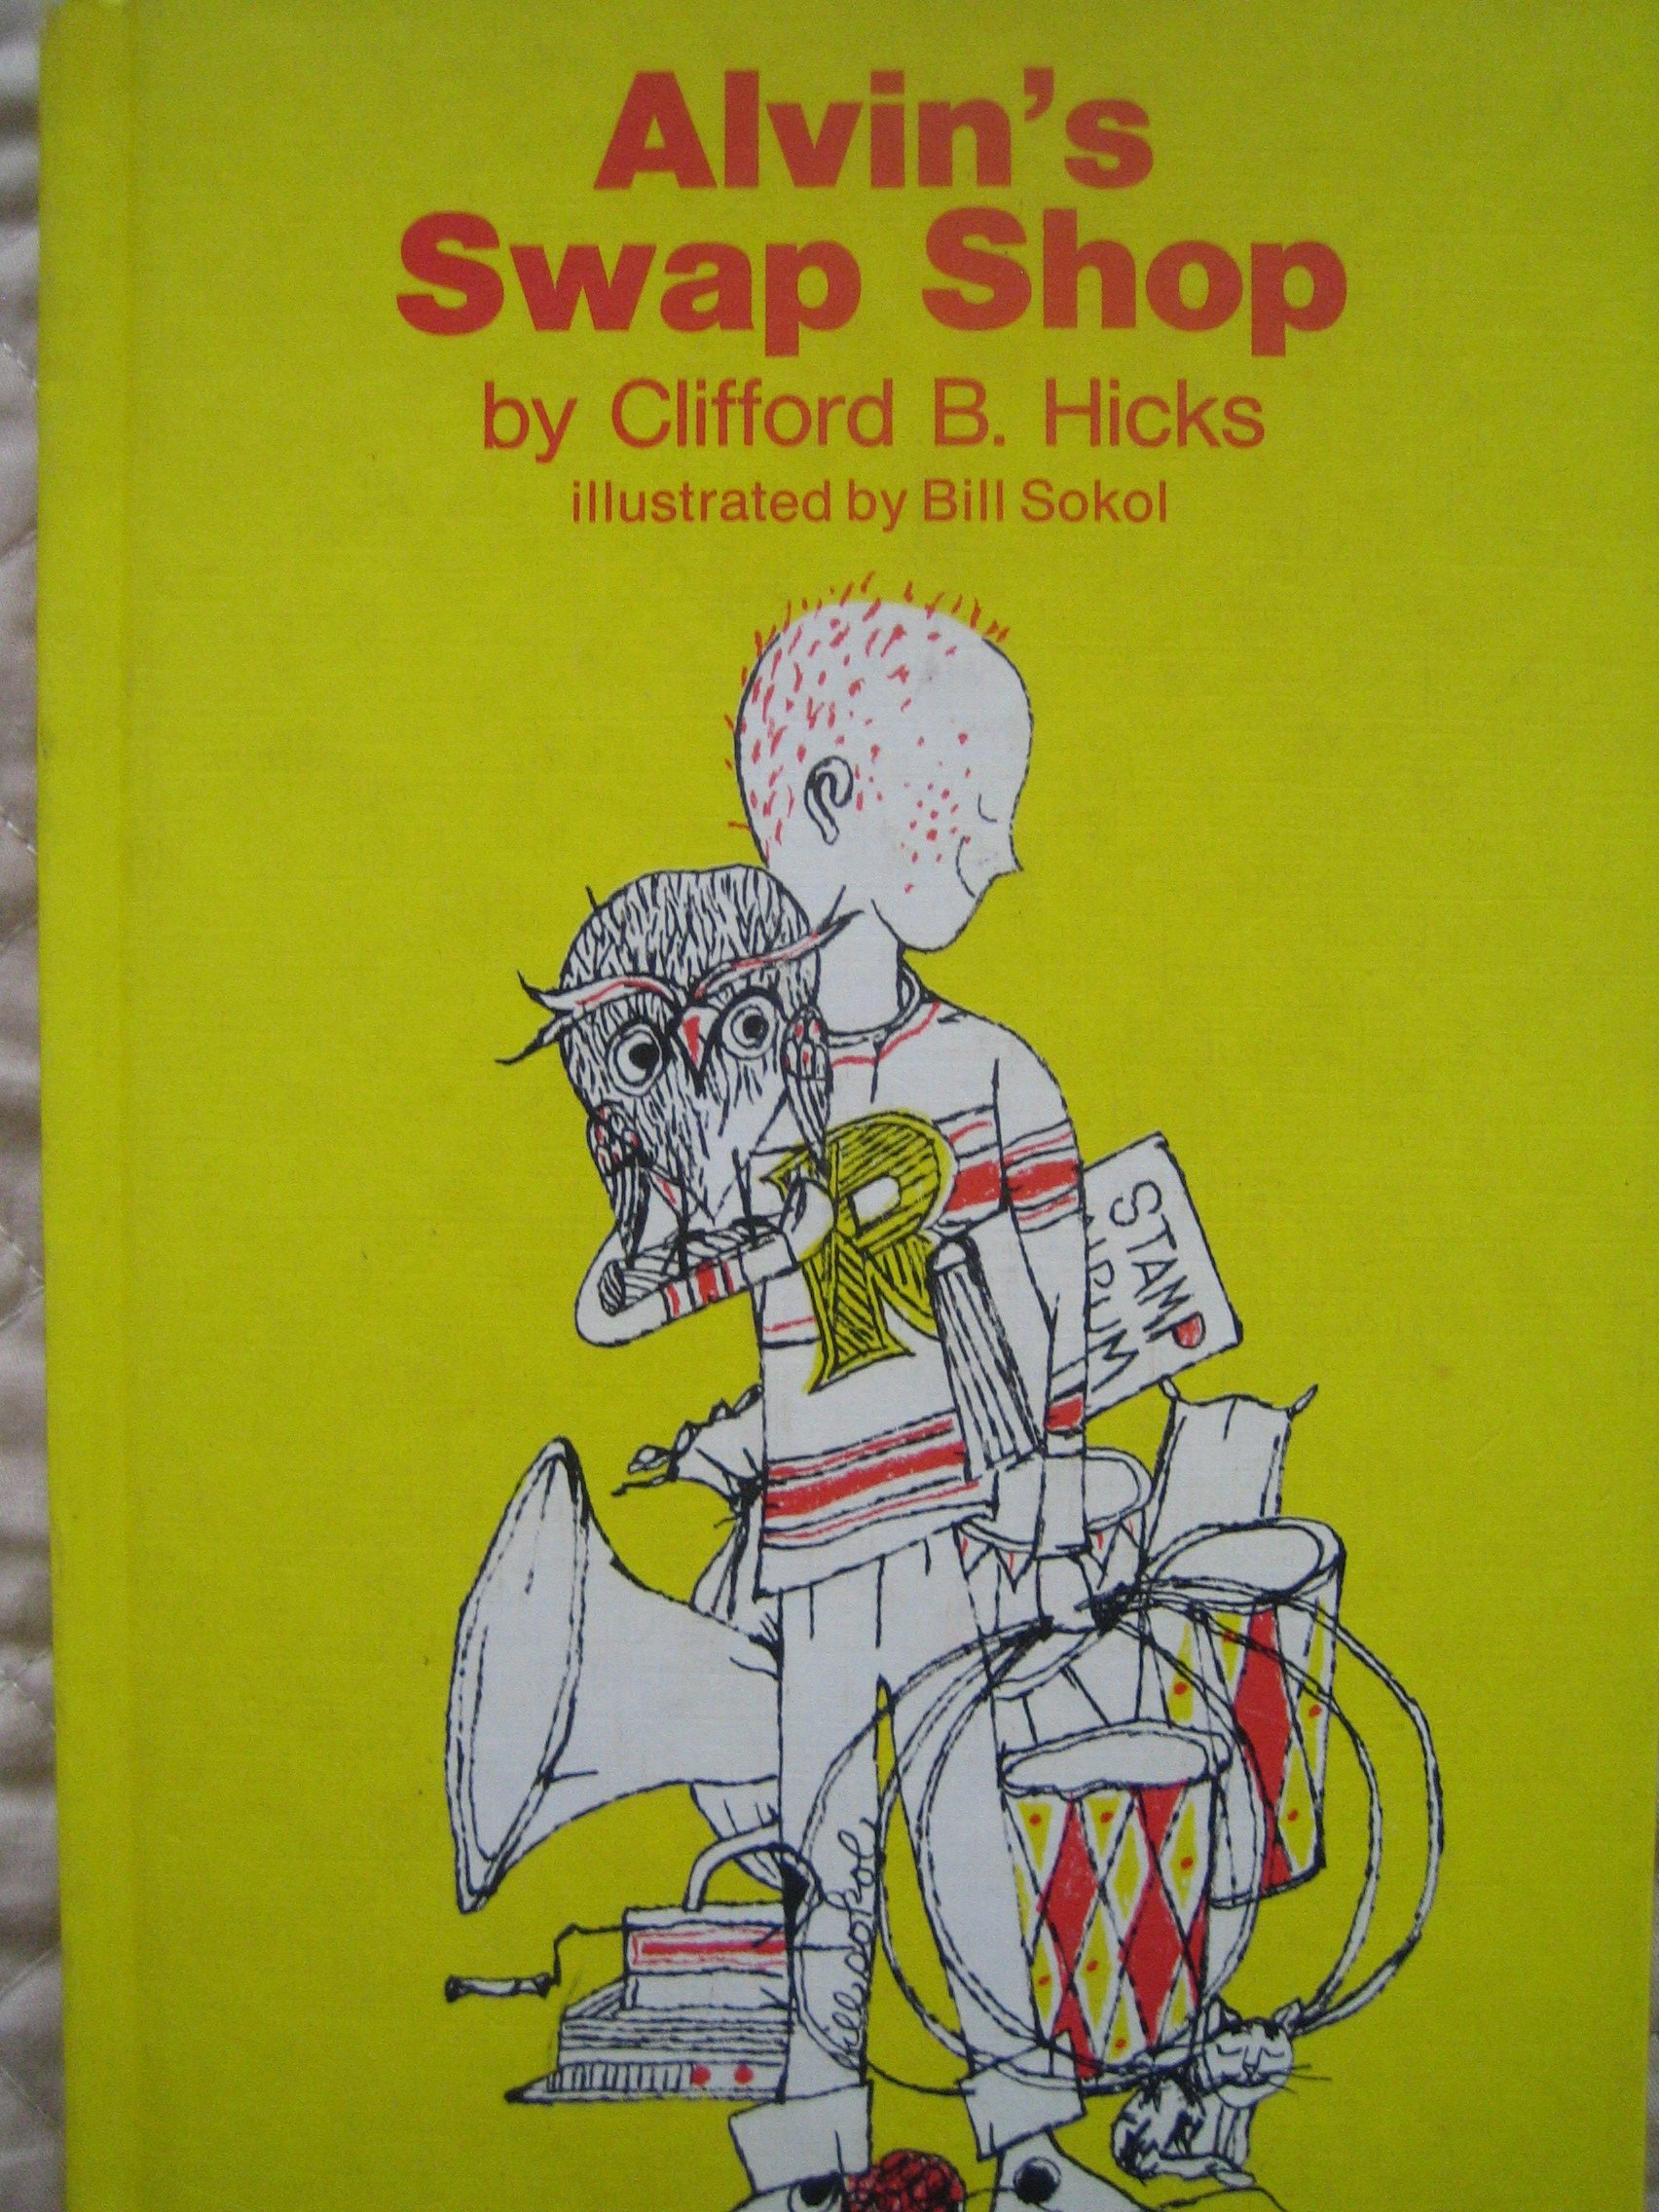 cdd959330c02 Alvin's Swap Shop: Clifford B. Hicks, Bill Sokol: Amazon.com: Books